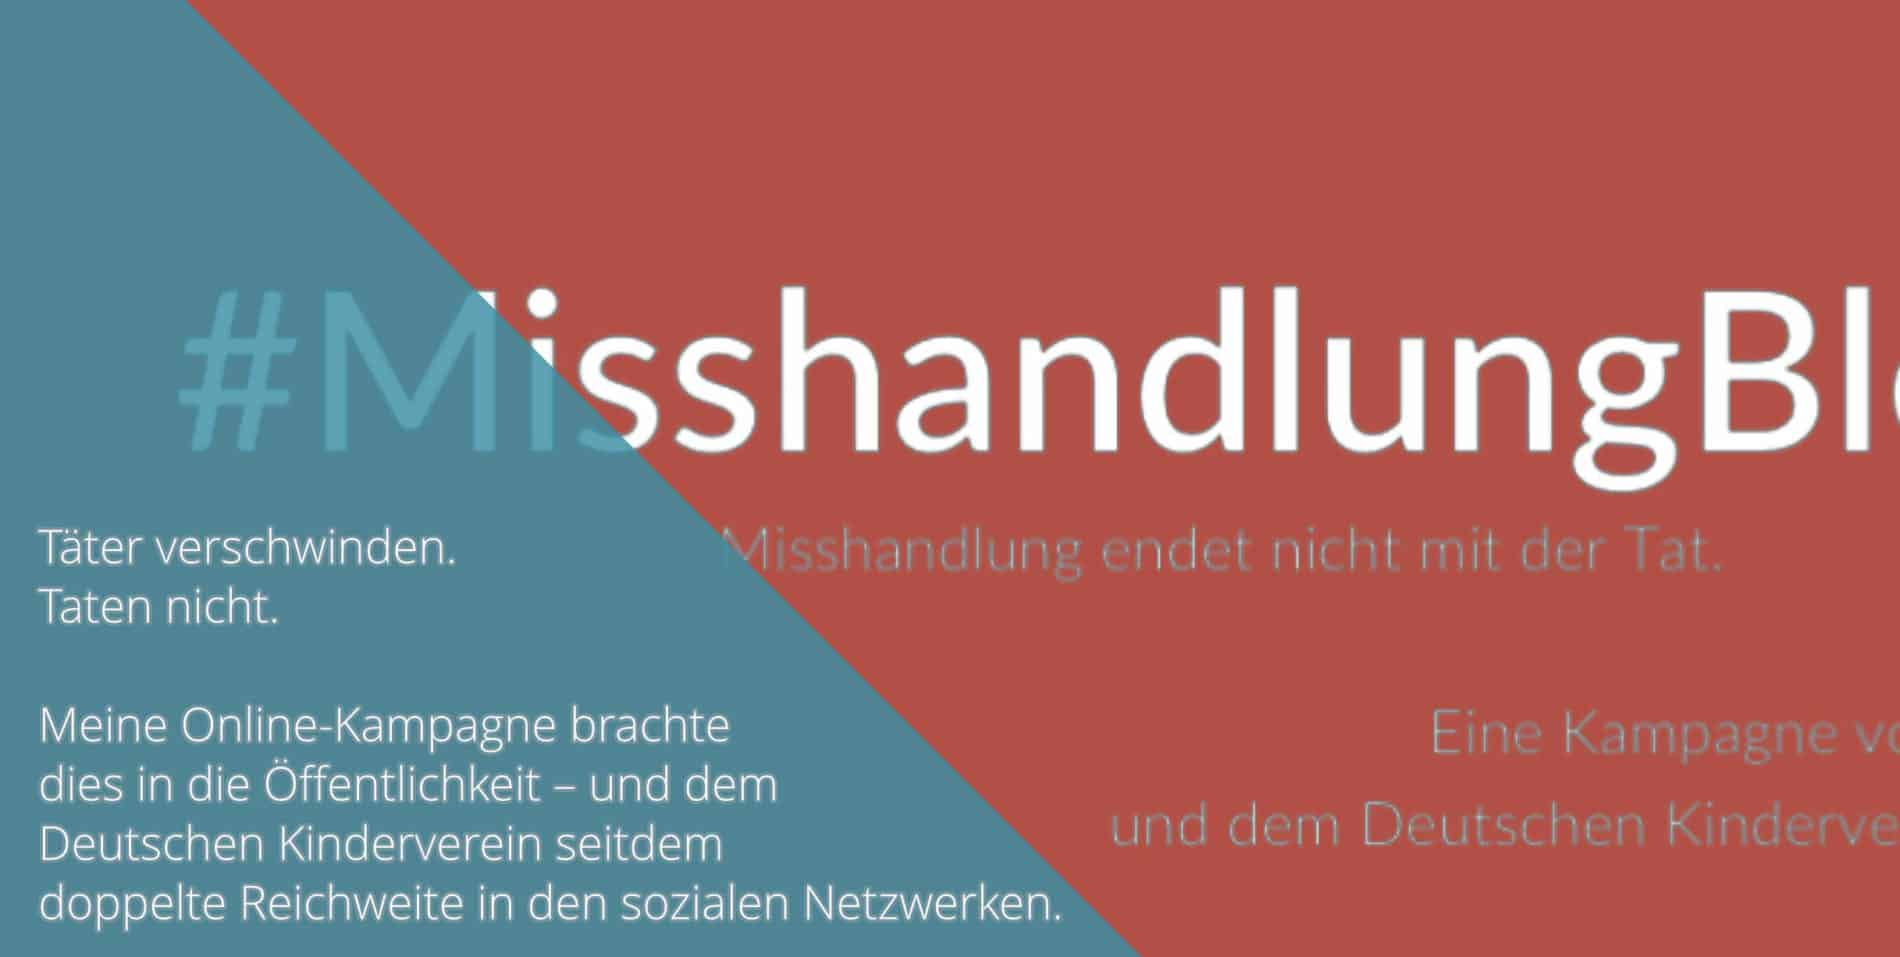 MisshandlungBleibt Kampagne DKVE Arbeitsprobe Tim Allgaier Texter PR Freelancer Werbetexter köln